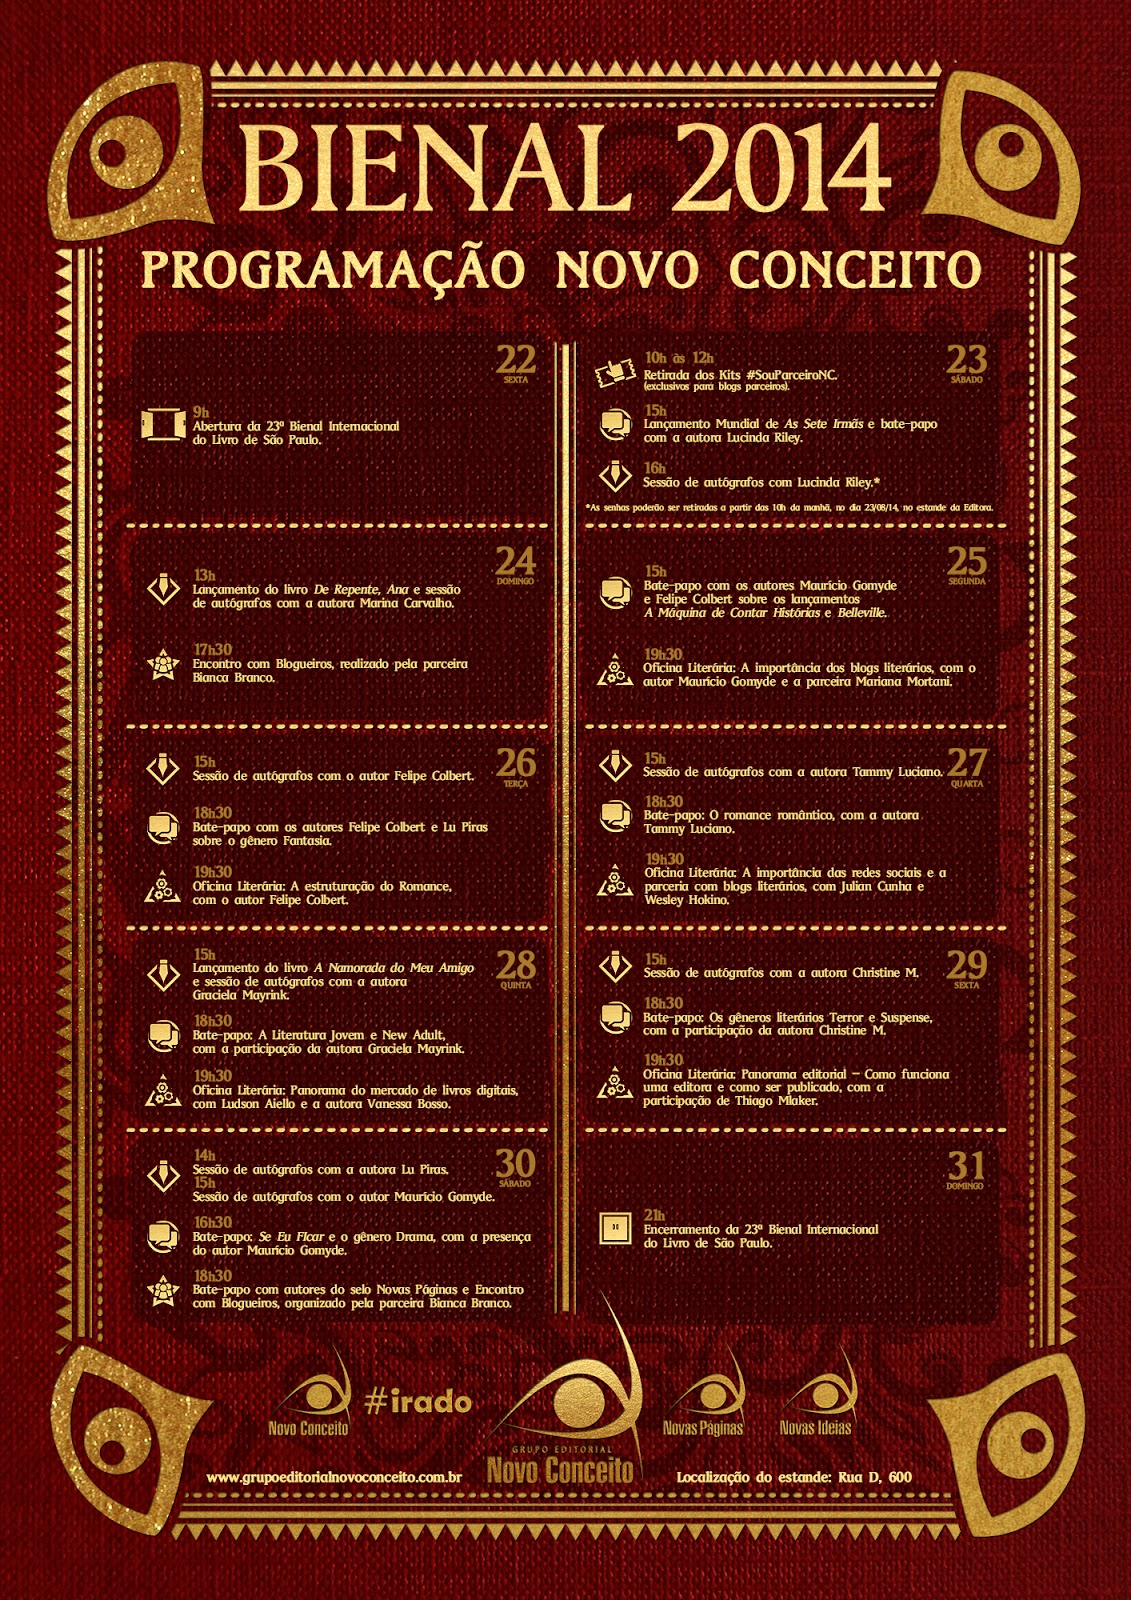 http://www.grupoeditorialnovoconceito.com.br/media/upload/peca_conceito_ok.jpg?utm_medium=email&utm_campaign=Alterao+na+programao+Bienal+2014&utm_content=Alterao+na+programao+Bienal+2014+CID_7e253c60f44f7744c09429ea8ddb6ff6&utm_source=EmailMarketing